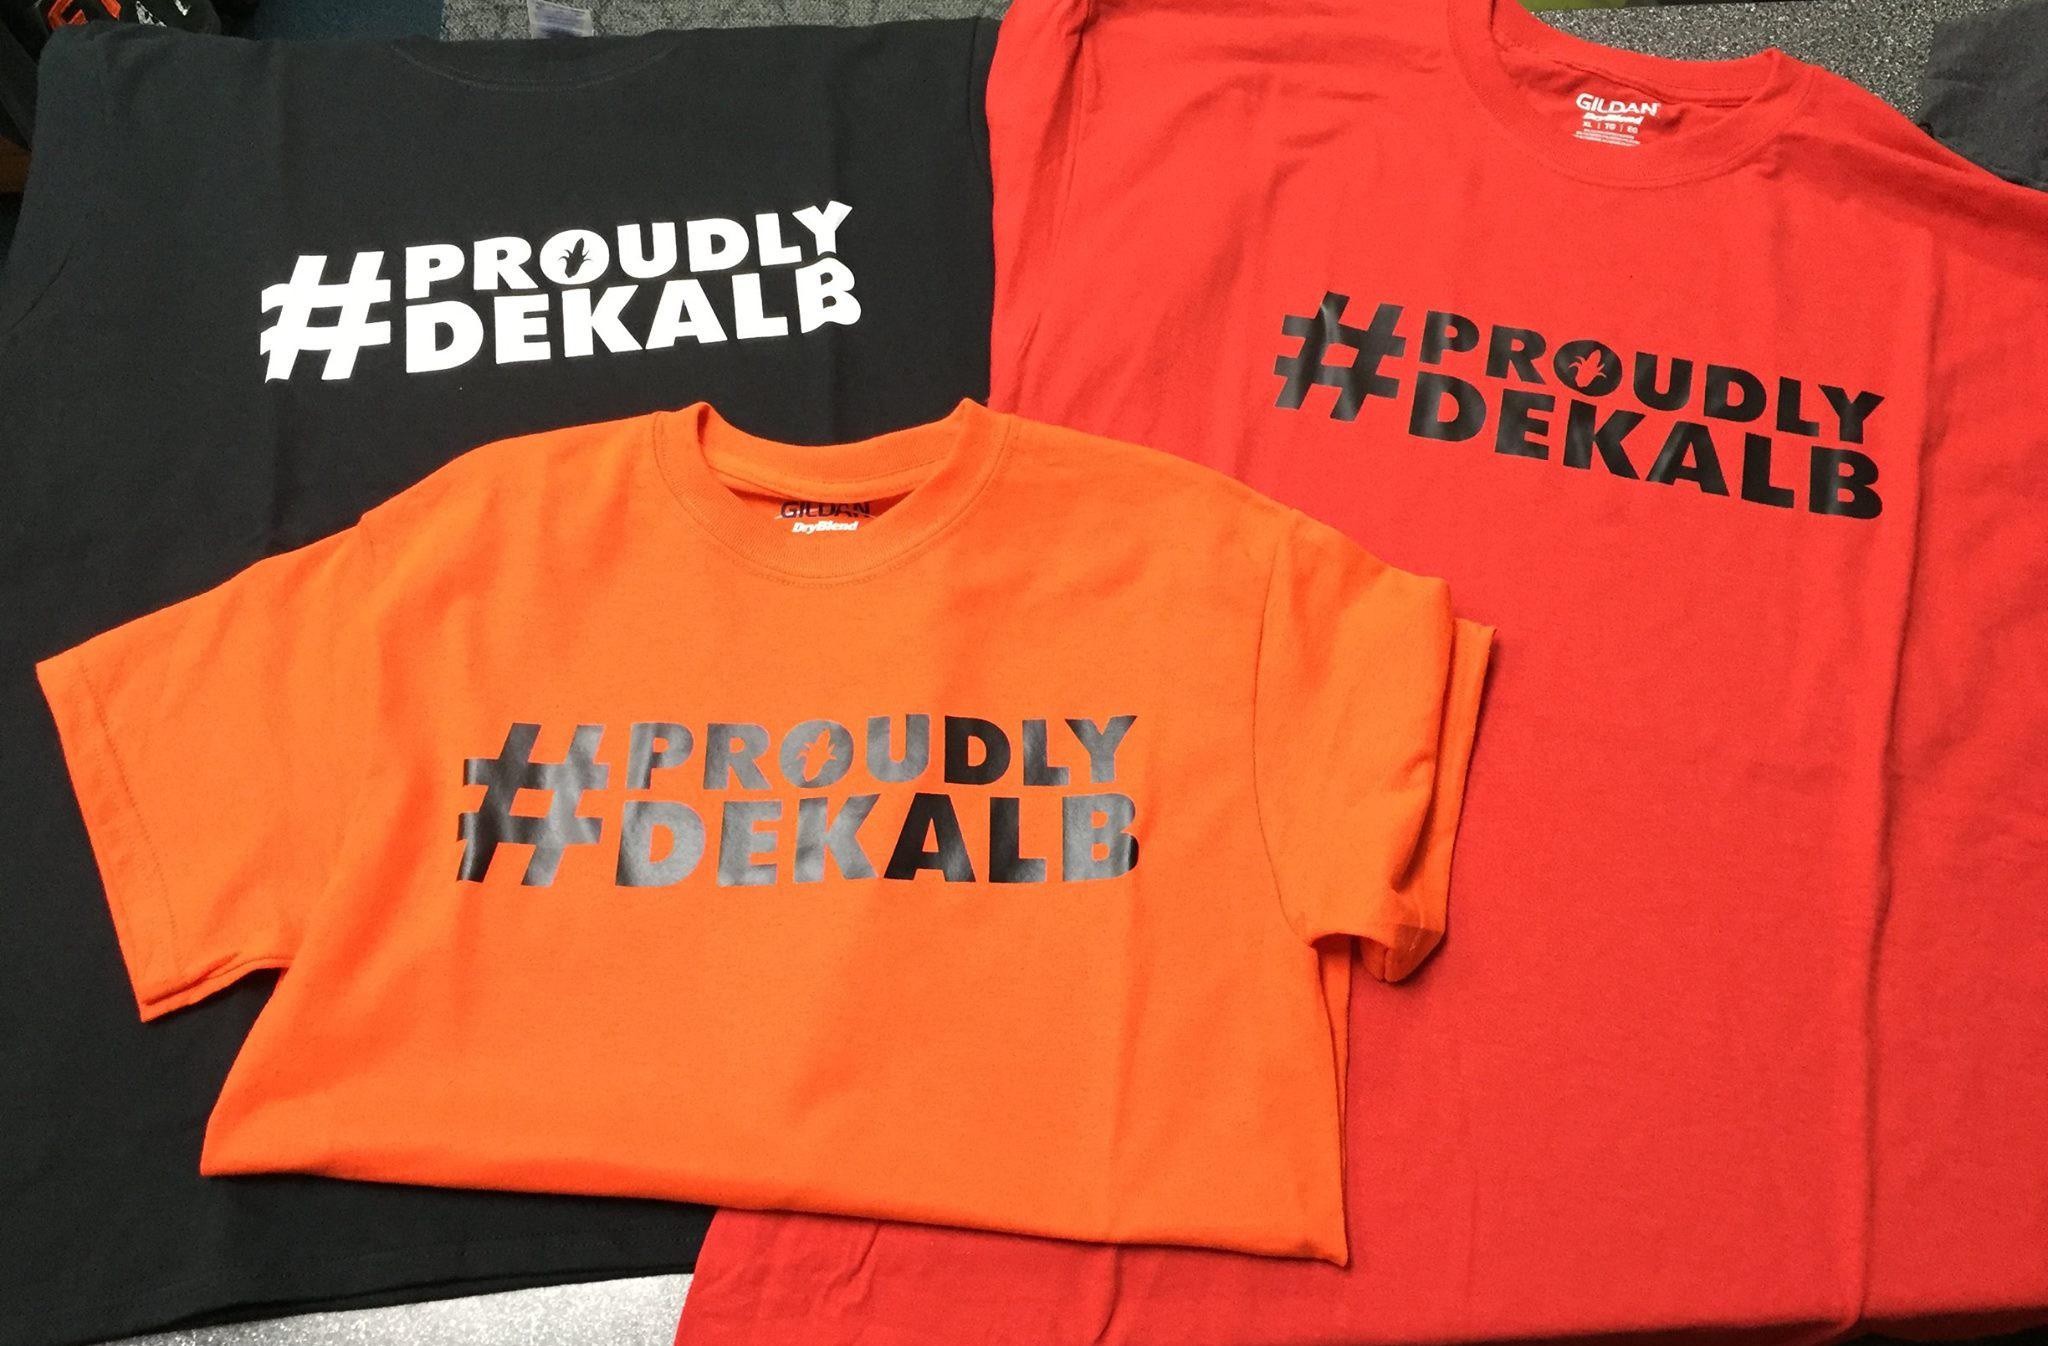 Proudly DeKalb t-shirts